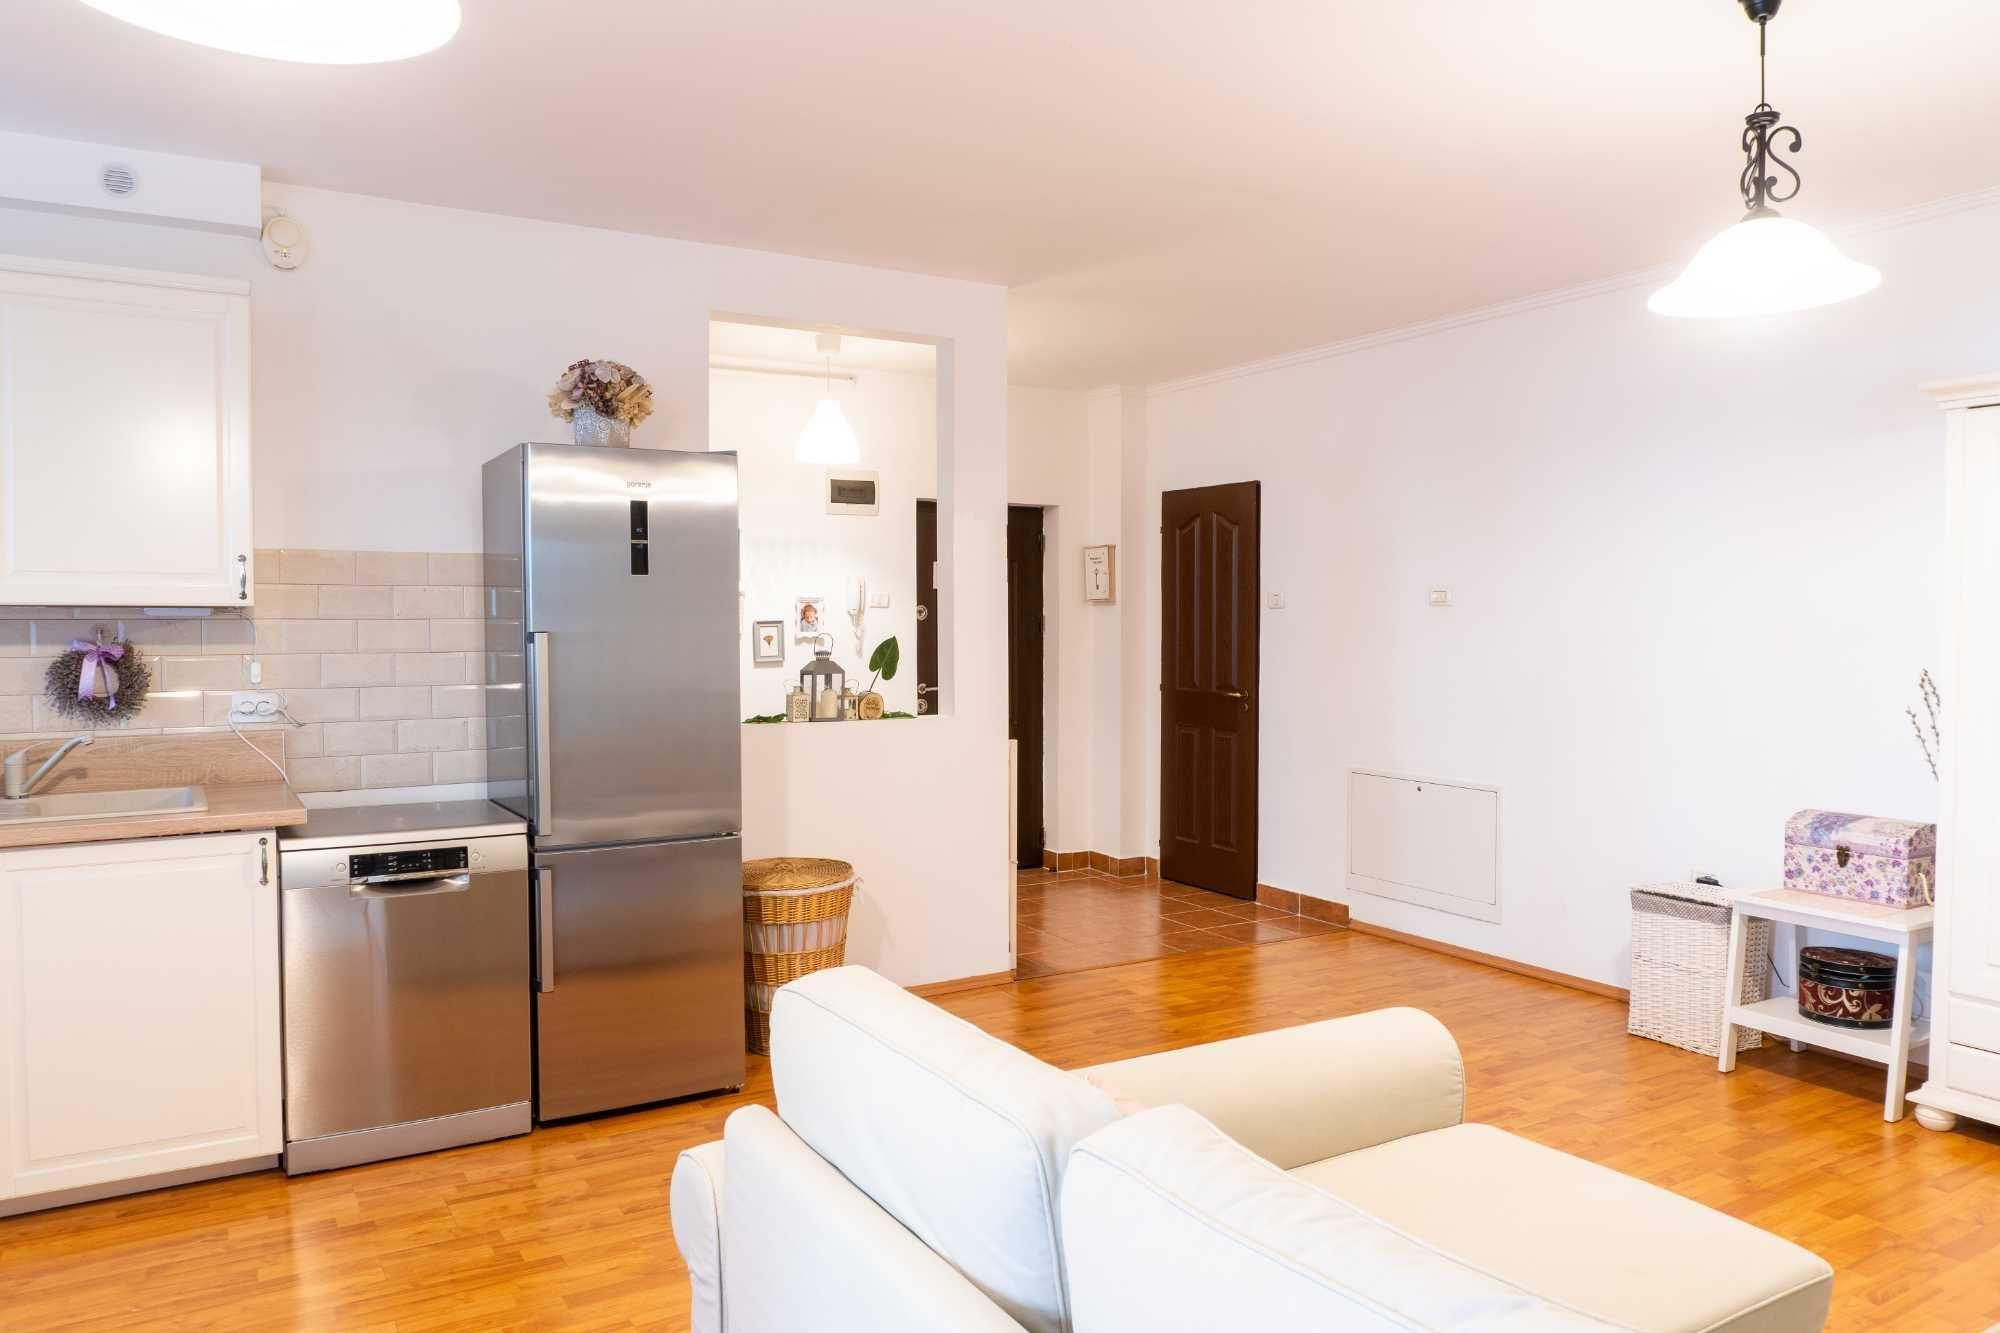 Apartament 2 camere, decomandat, etaj 1, bloc nou Soarelui